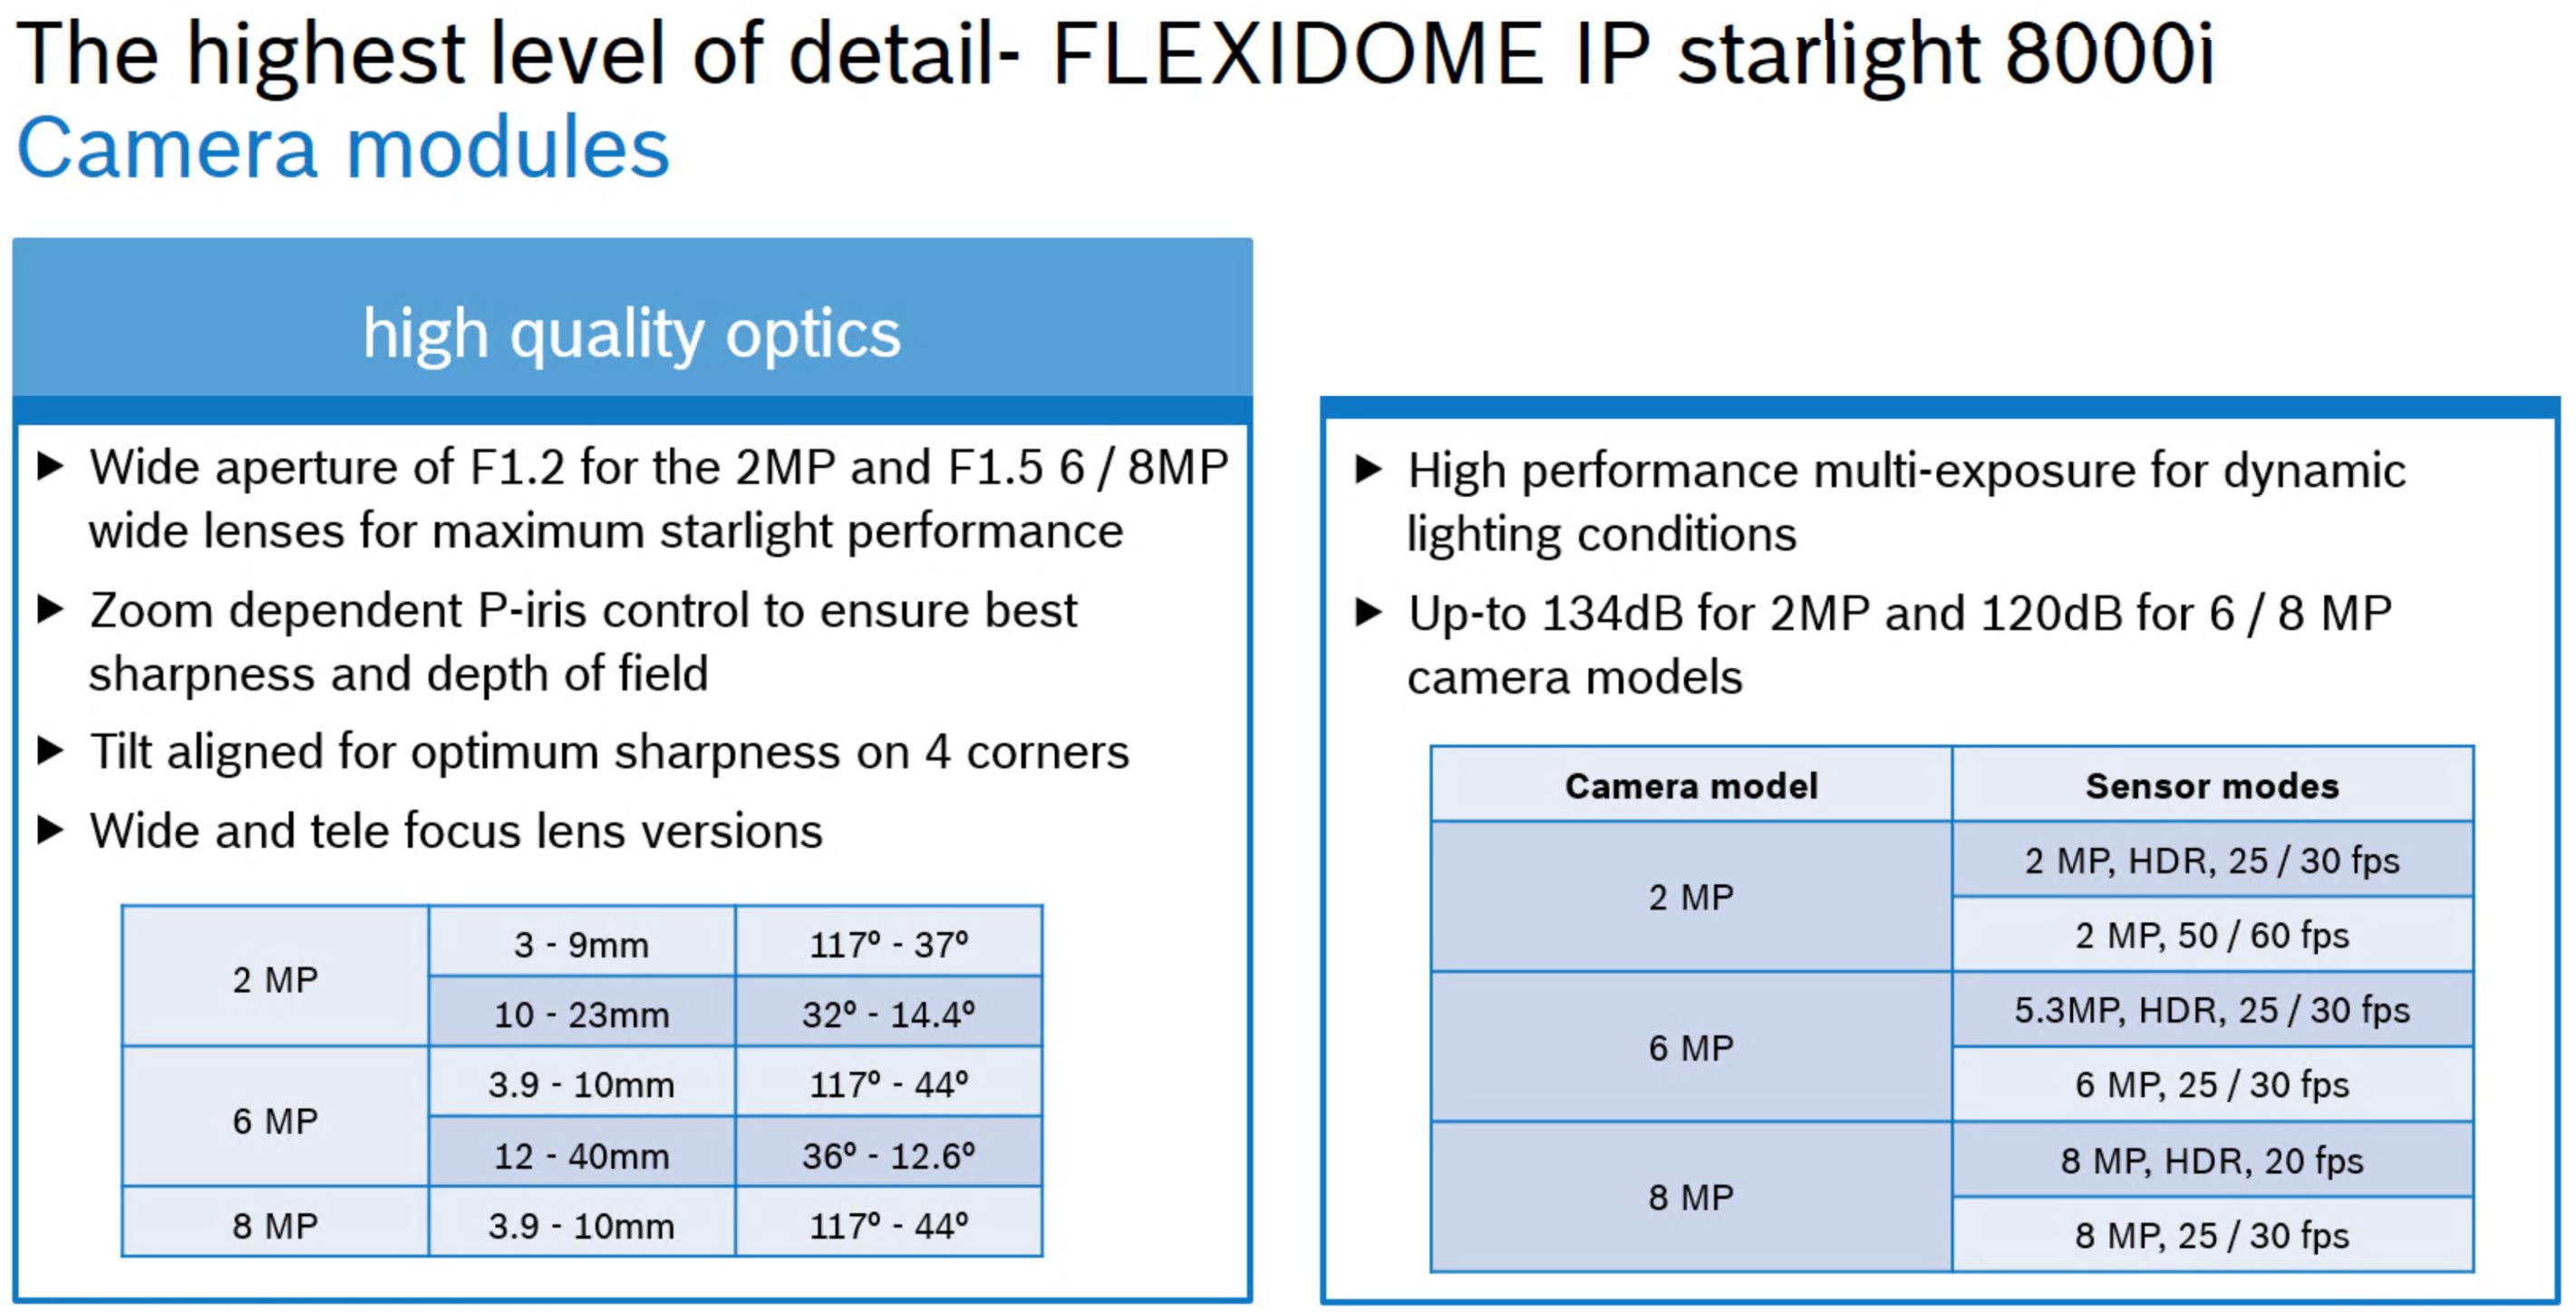 Bosch Flexidome IP 8000i lens information slide